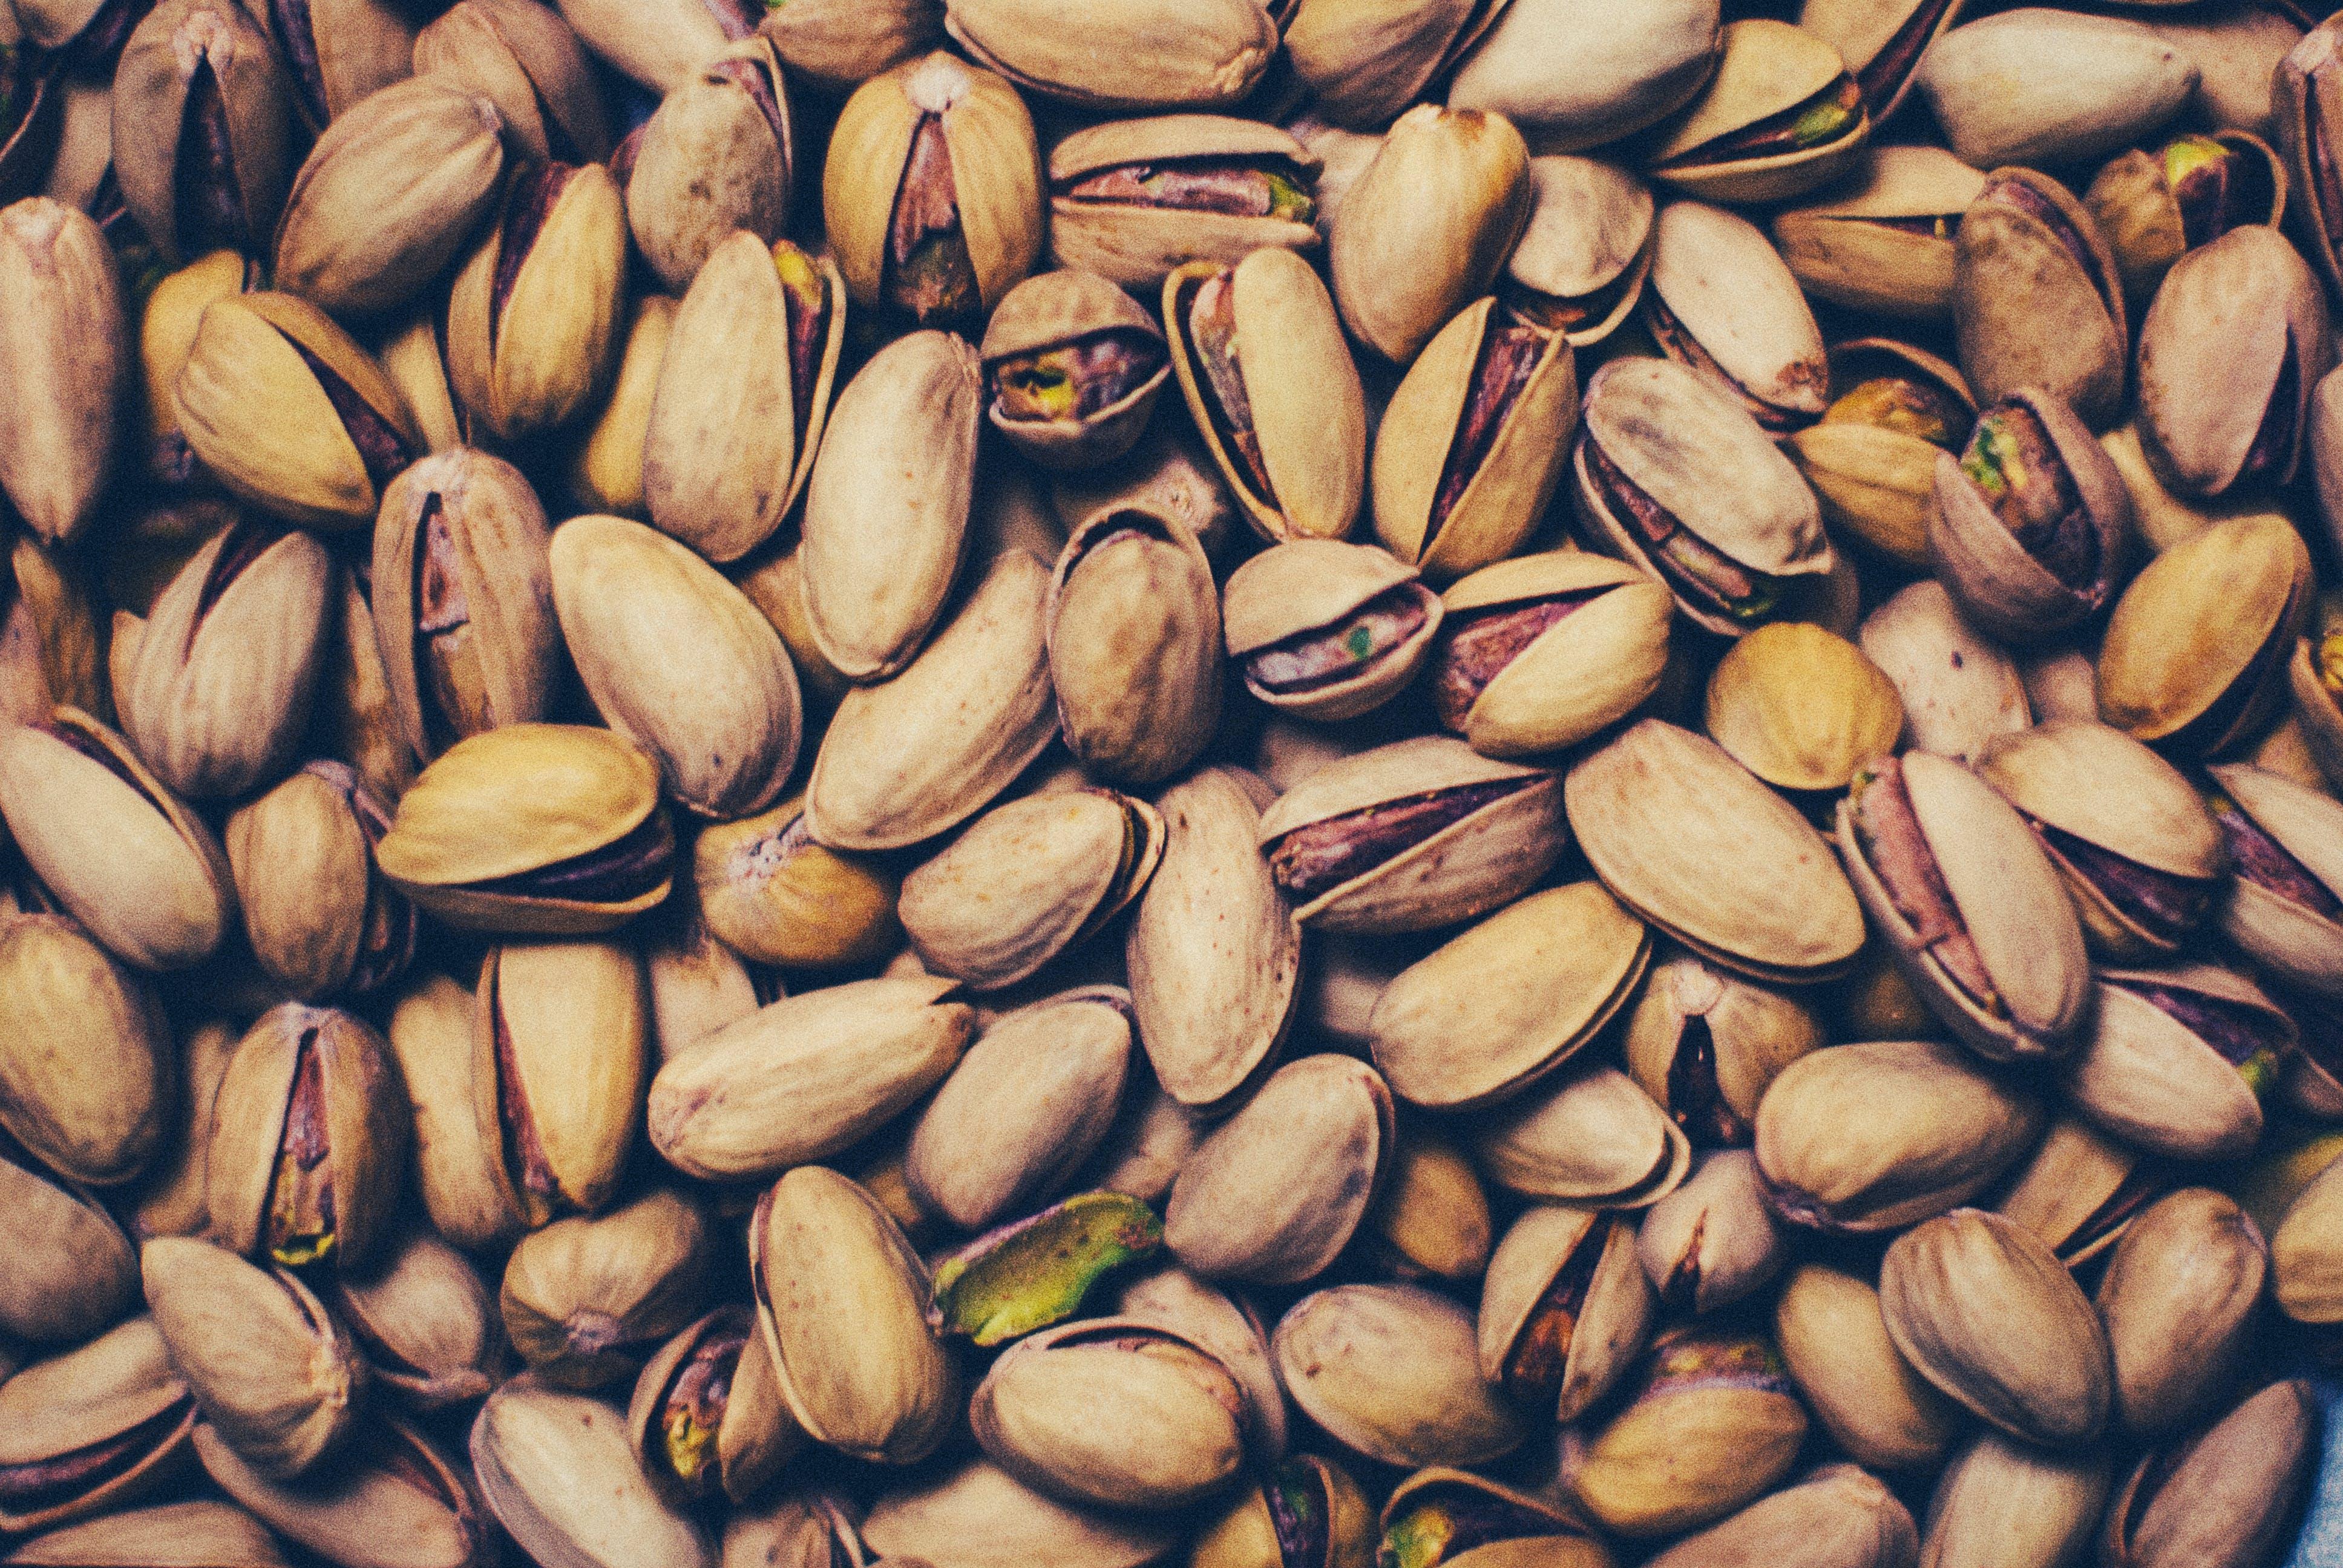 food, nuts, pistachios